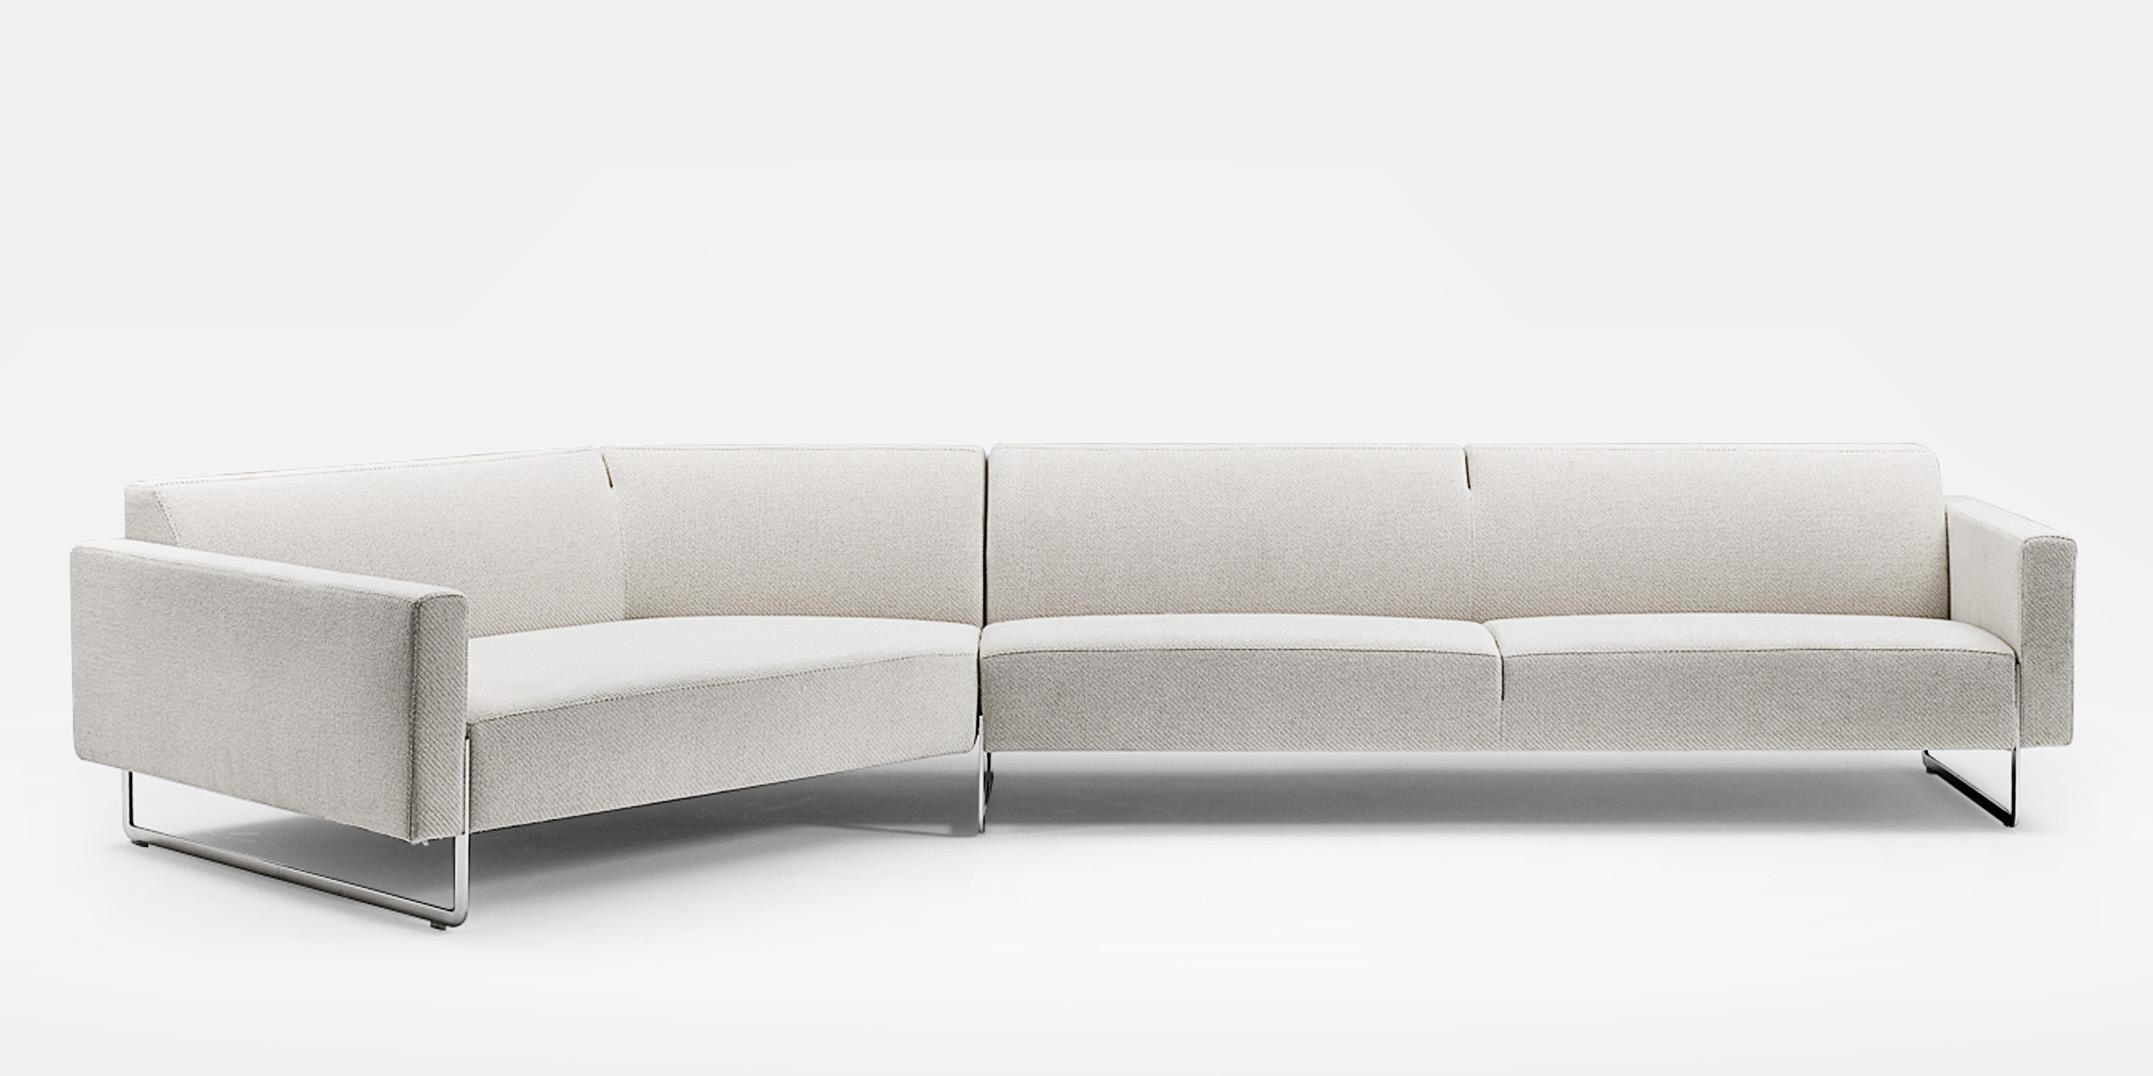 sofa-more - sofa ideas